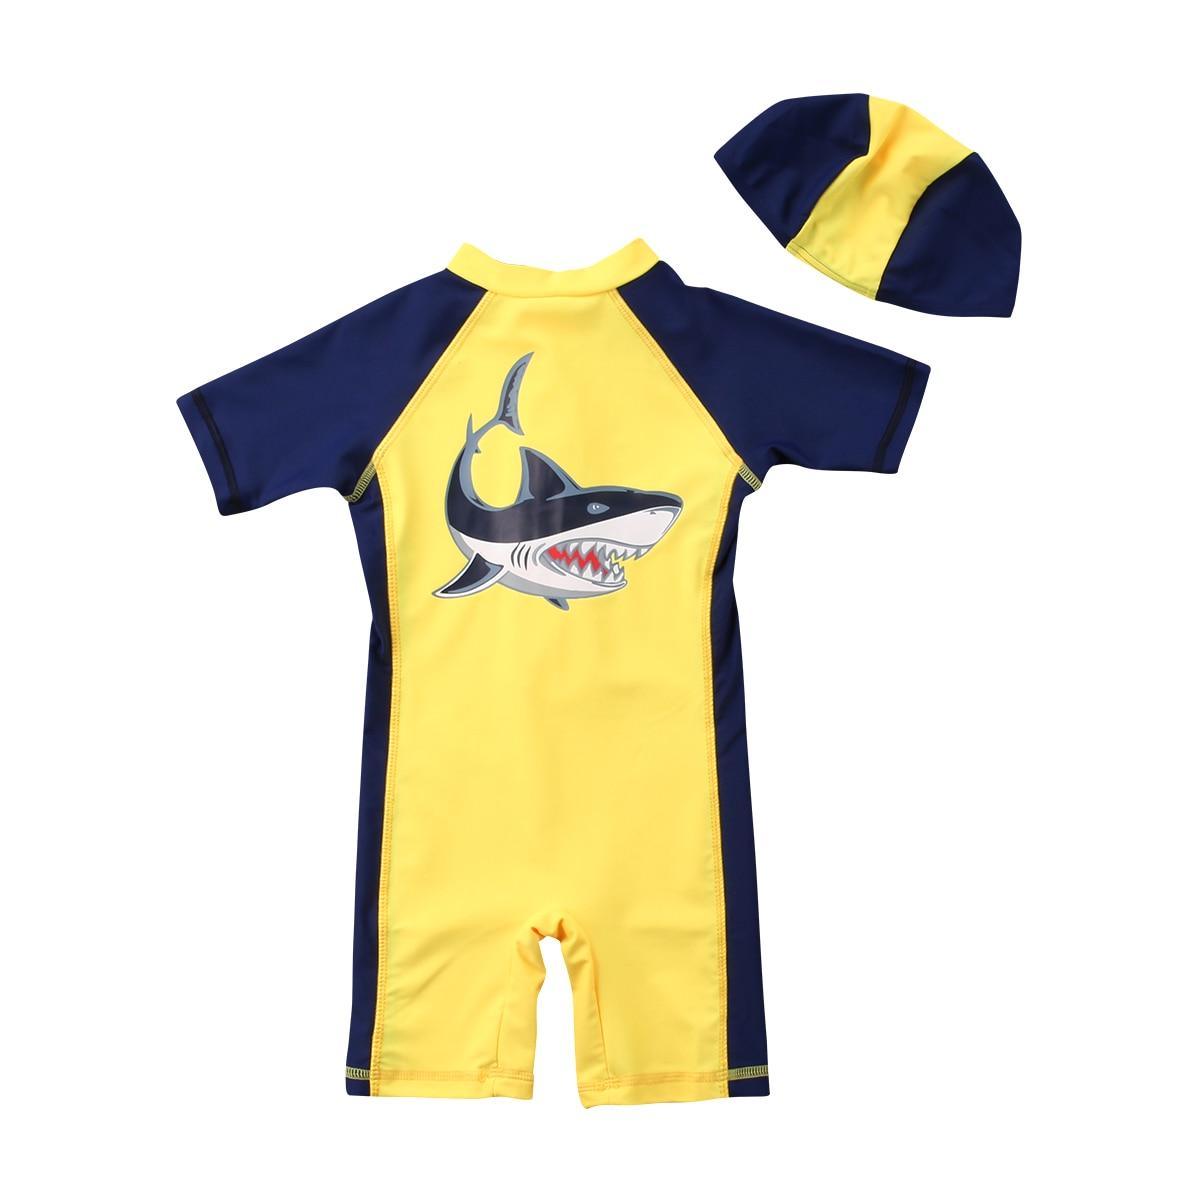 2018 Brand New Toddler Infant Child Kids Swimsuit Shark Boys Soft Swimwear Bathing Suit Costume Clothes +Hat 2Pcs Set 1-6T